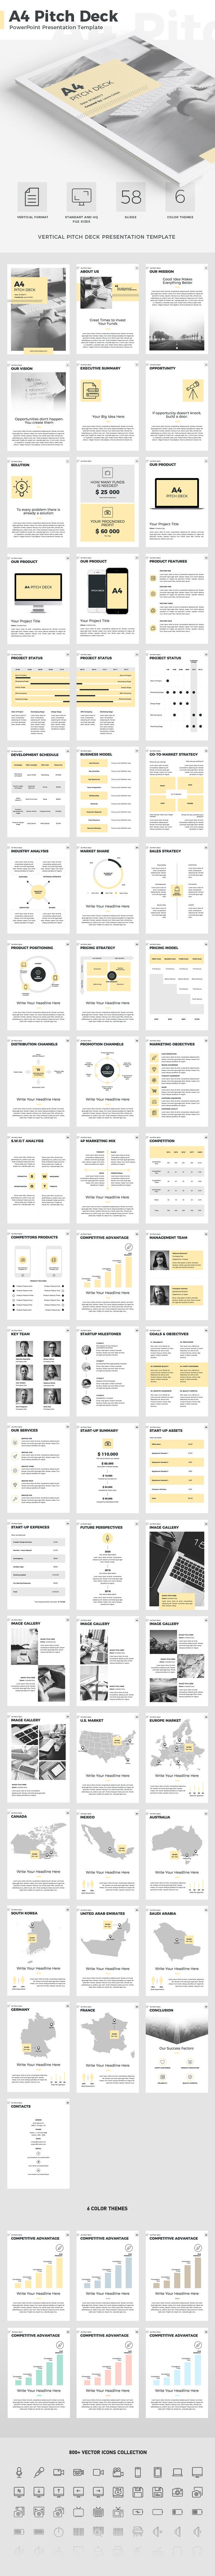 A4 Pitch Deck Vertical PowerPoint Template - Business PowerPoint Templates